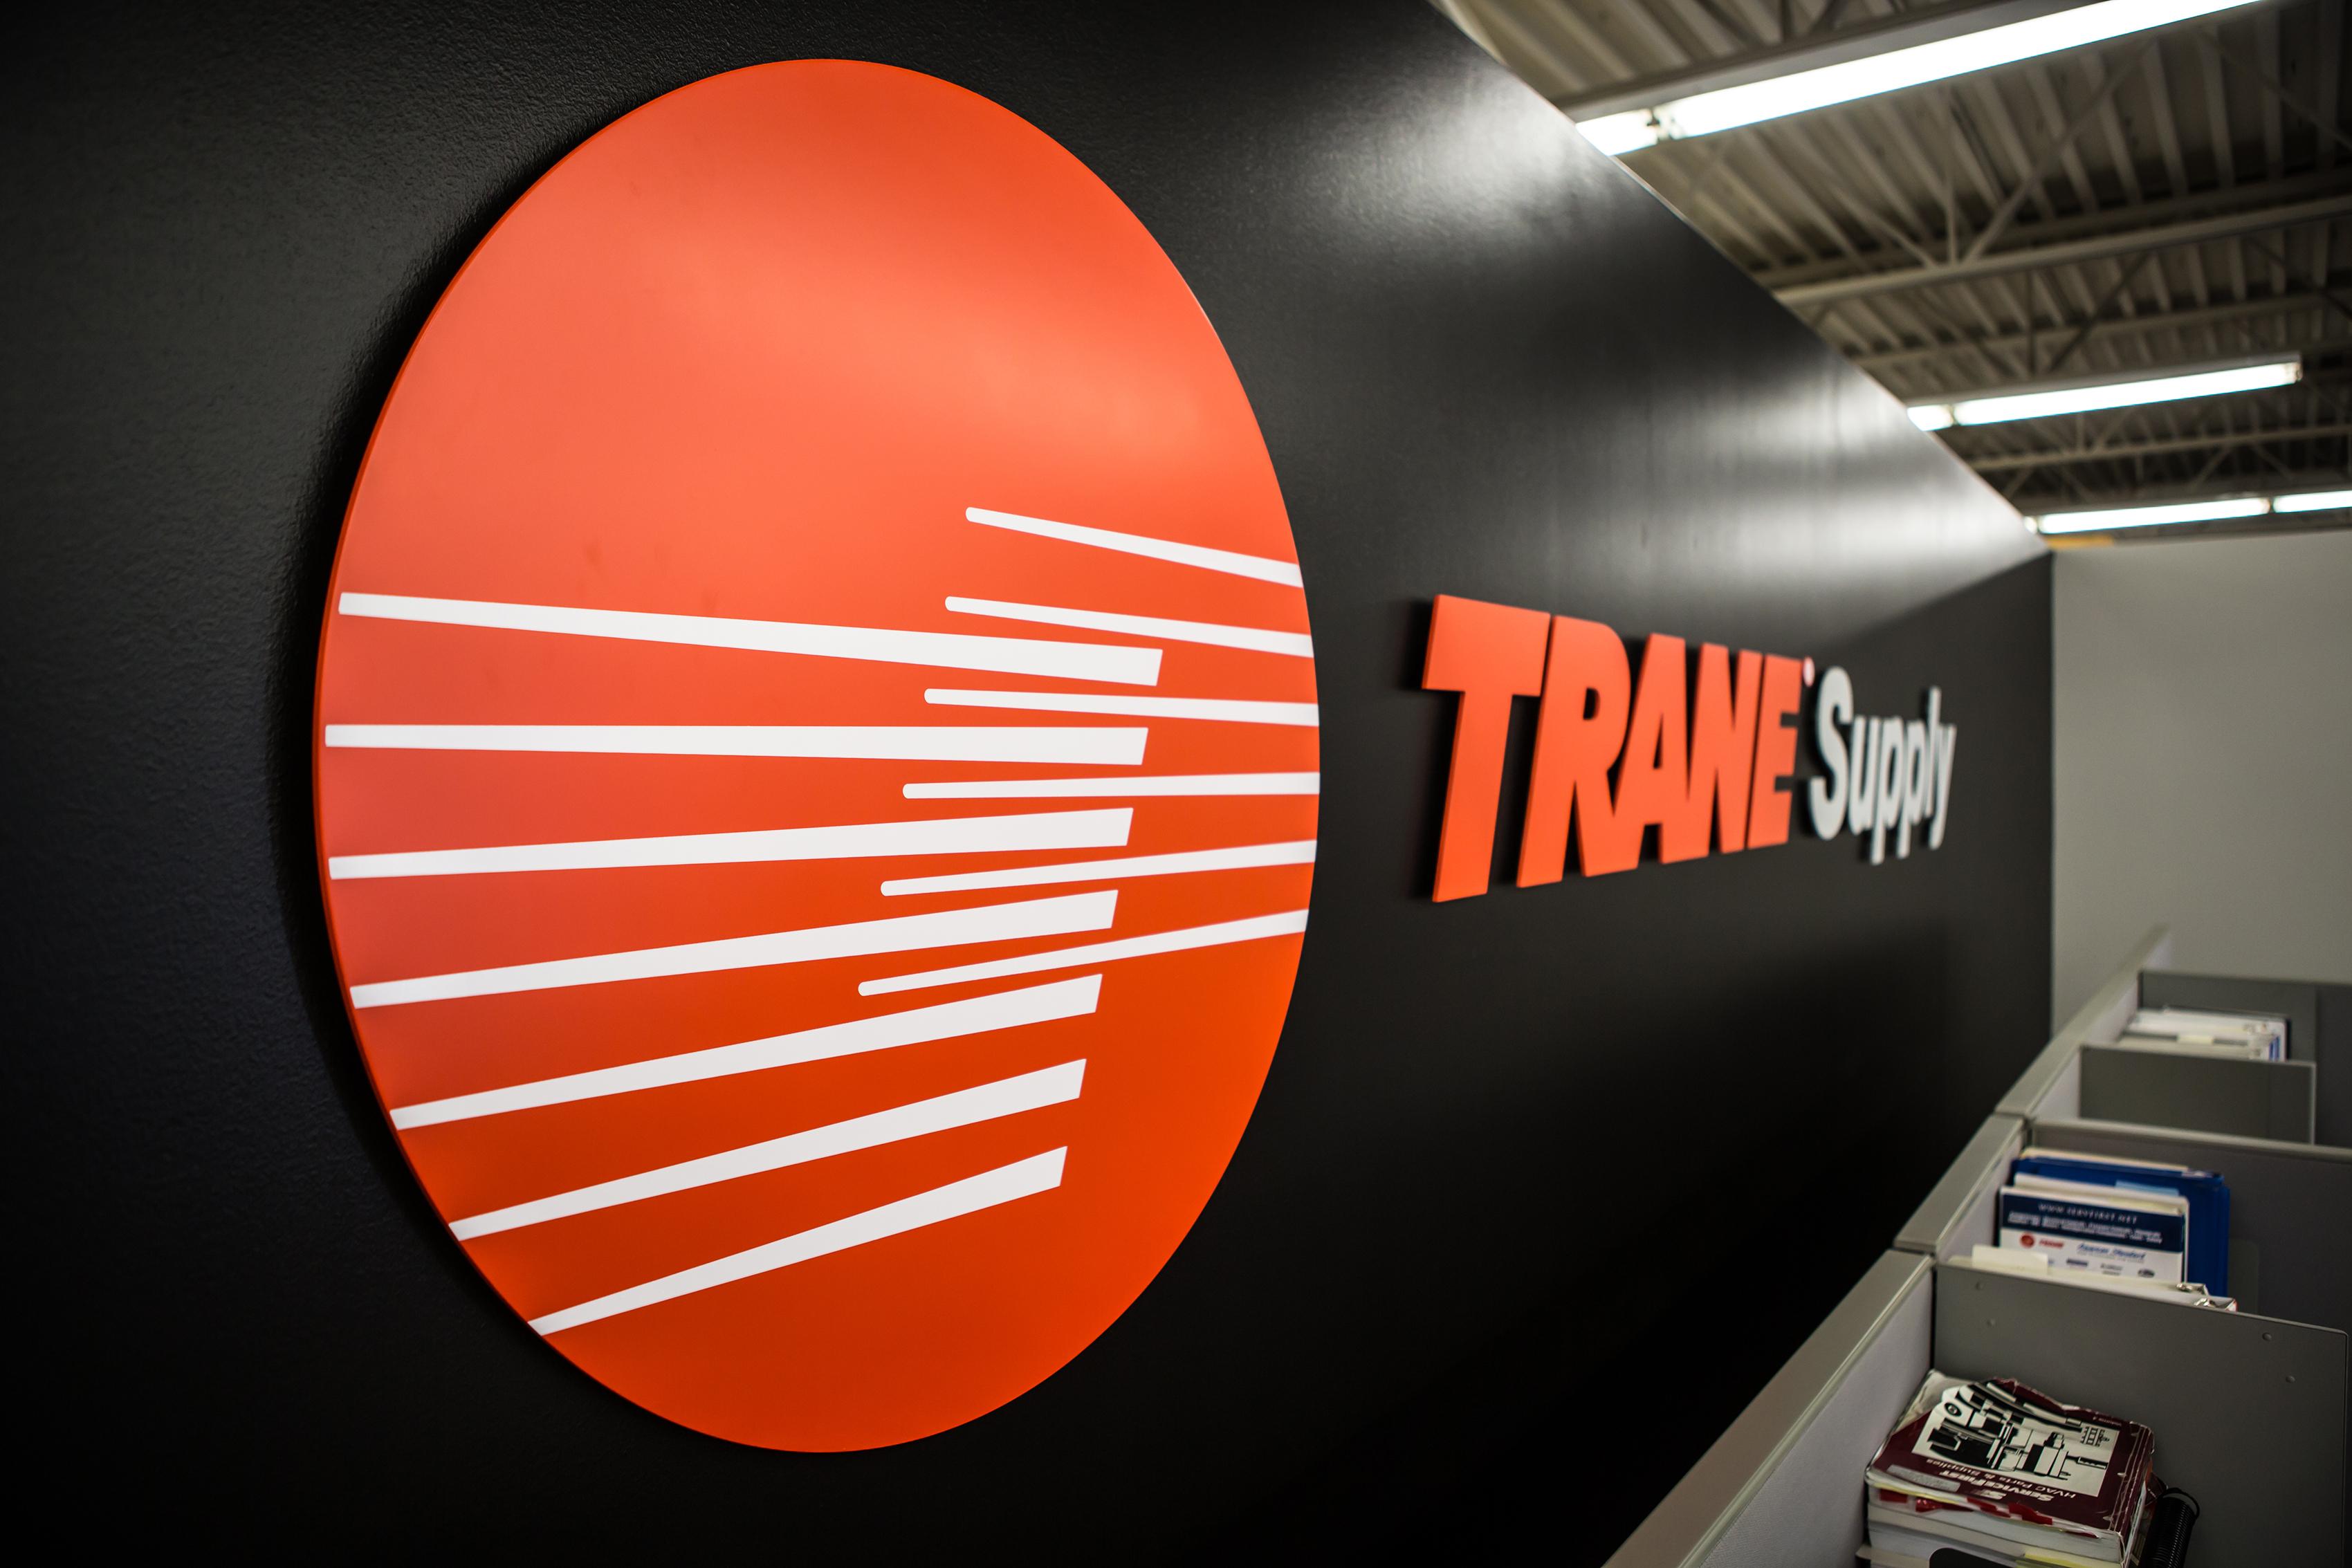 Trane Supply in Edmonton